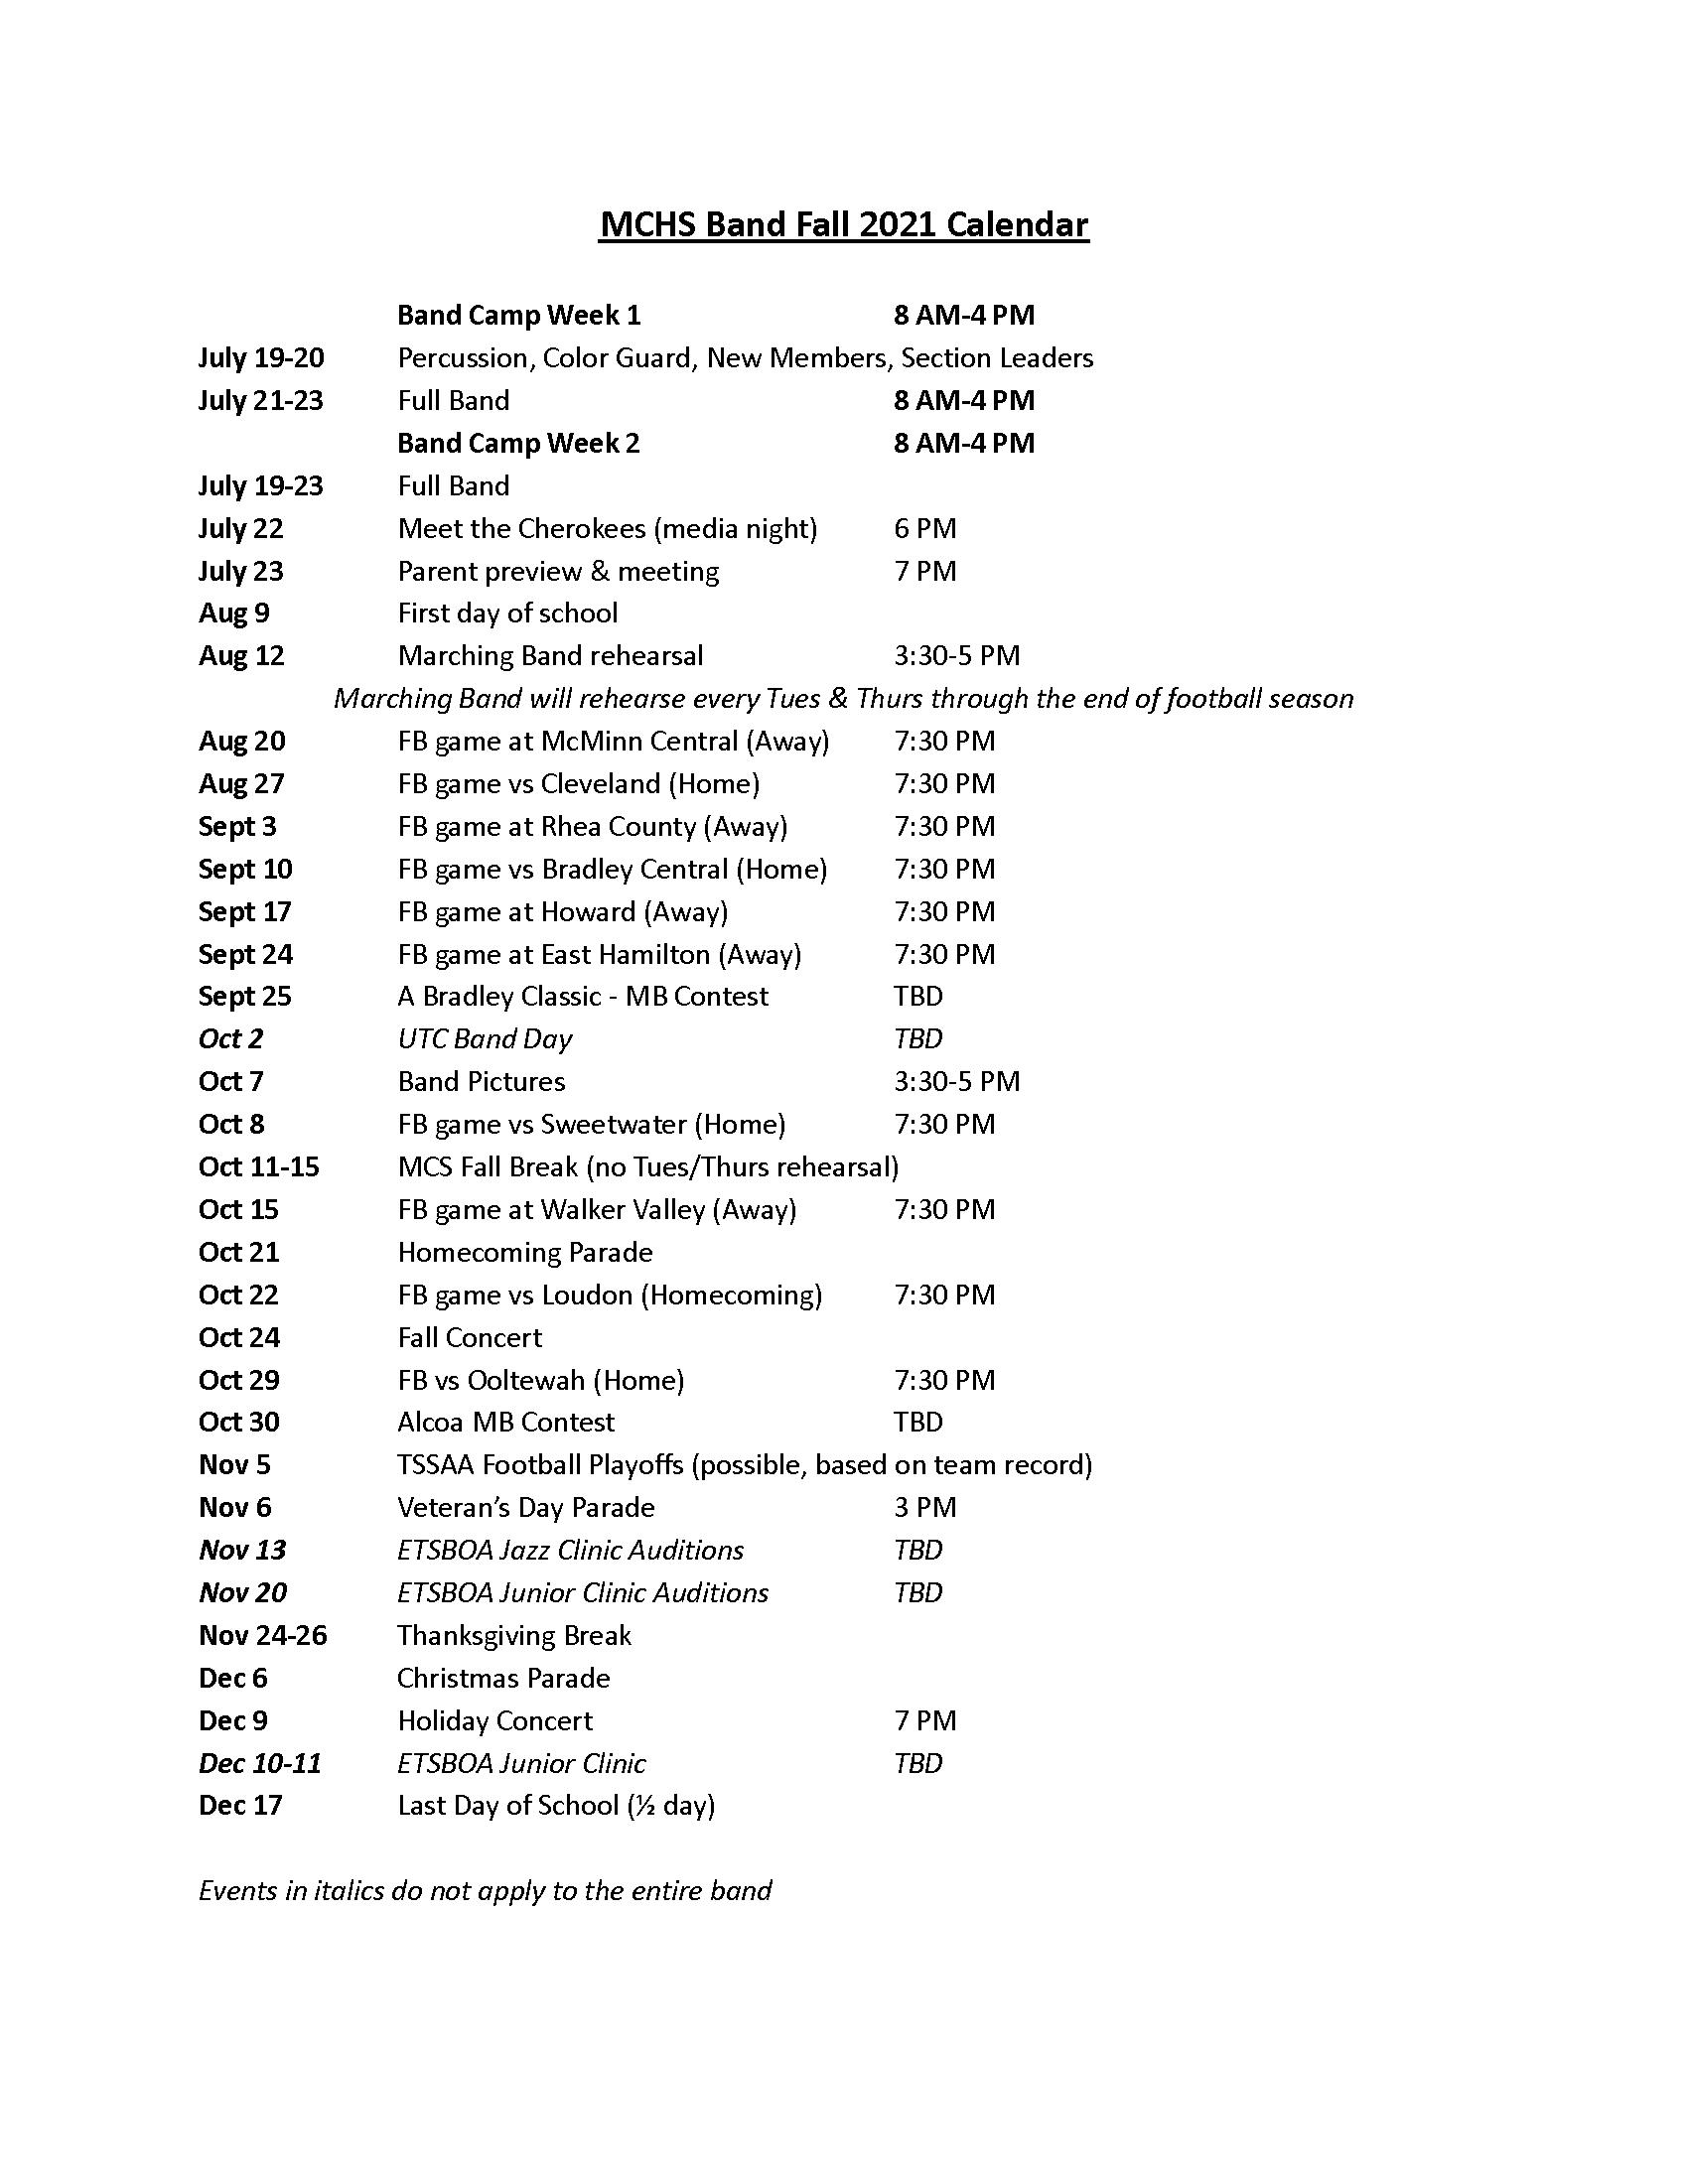 MCHS Band Fall 2021 Calendar